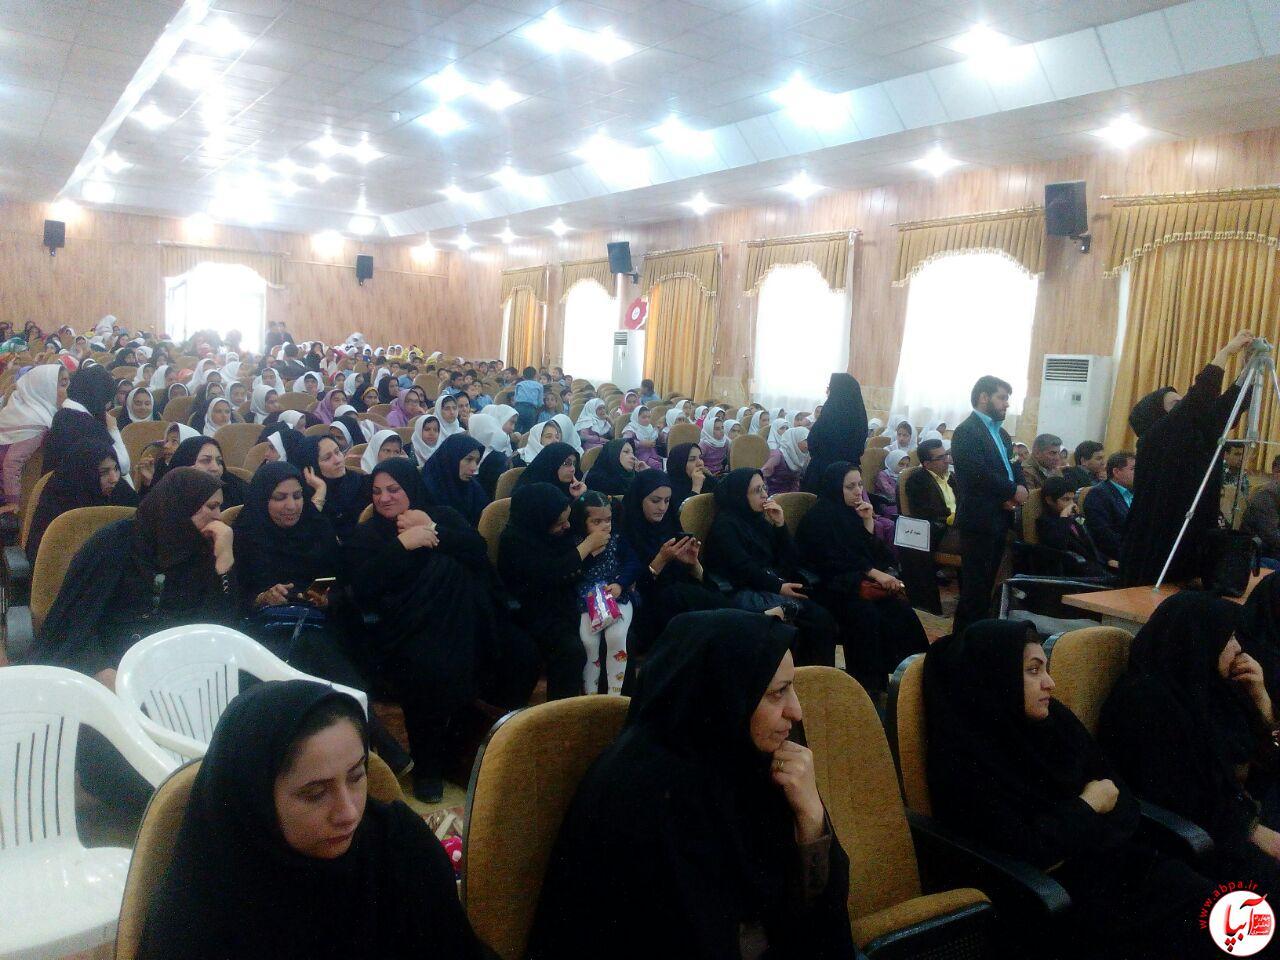 20fd710a-3c1f-4ea1-b199-a4727b70cdbd برگزاری همایش گلستان خوانی در تالار معلم فراشبند